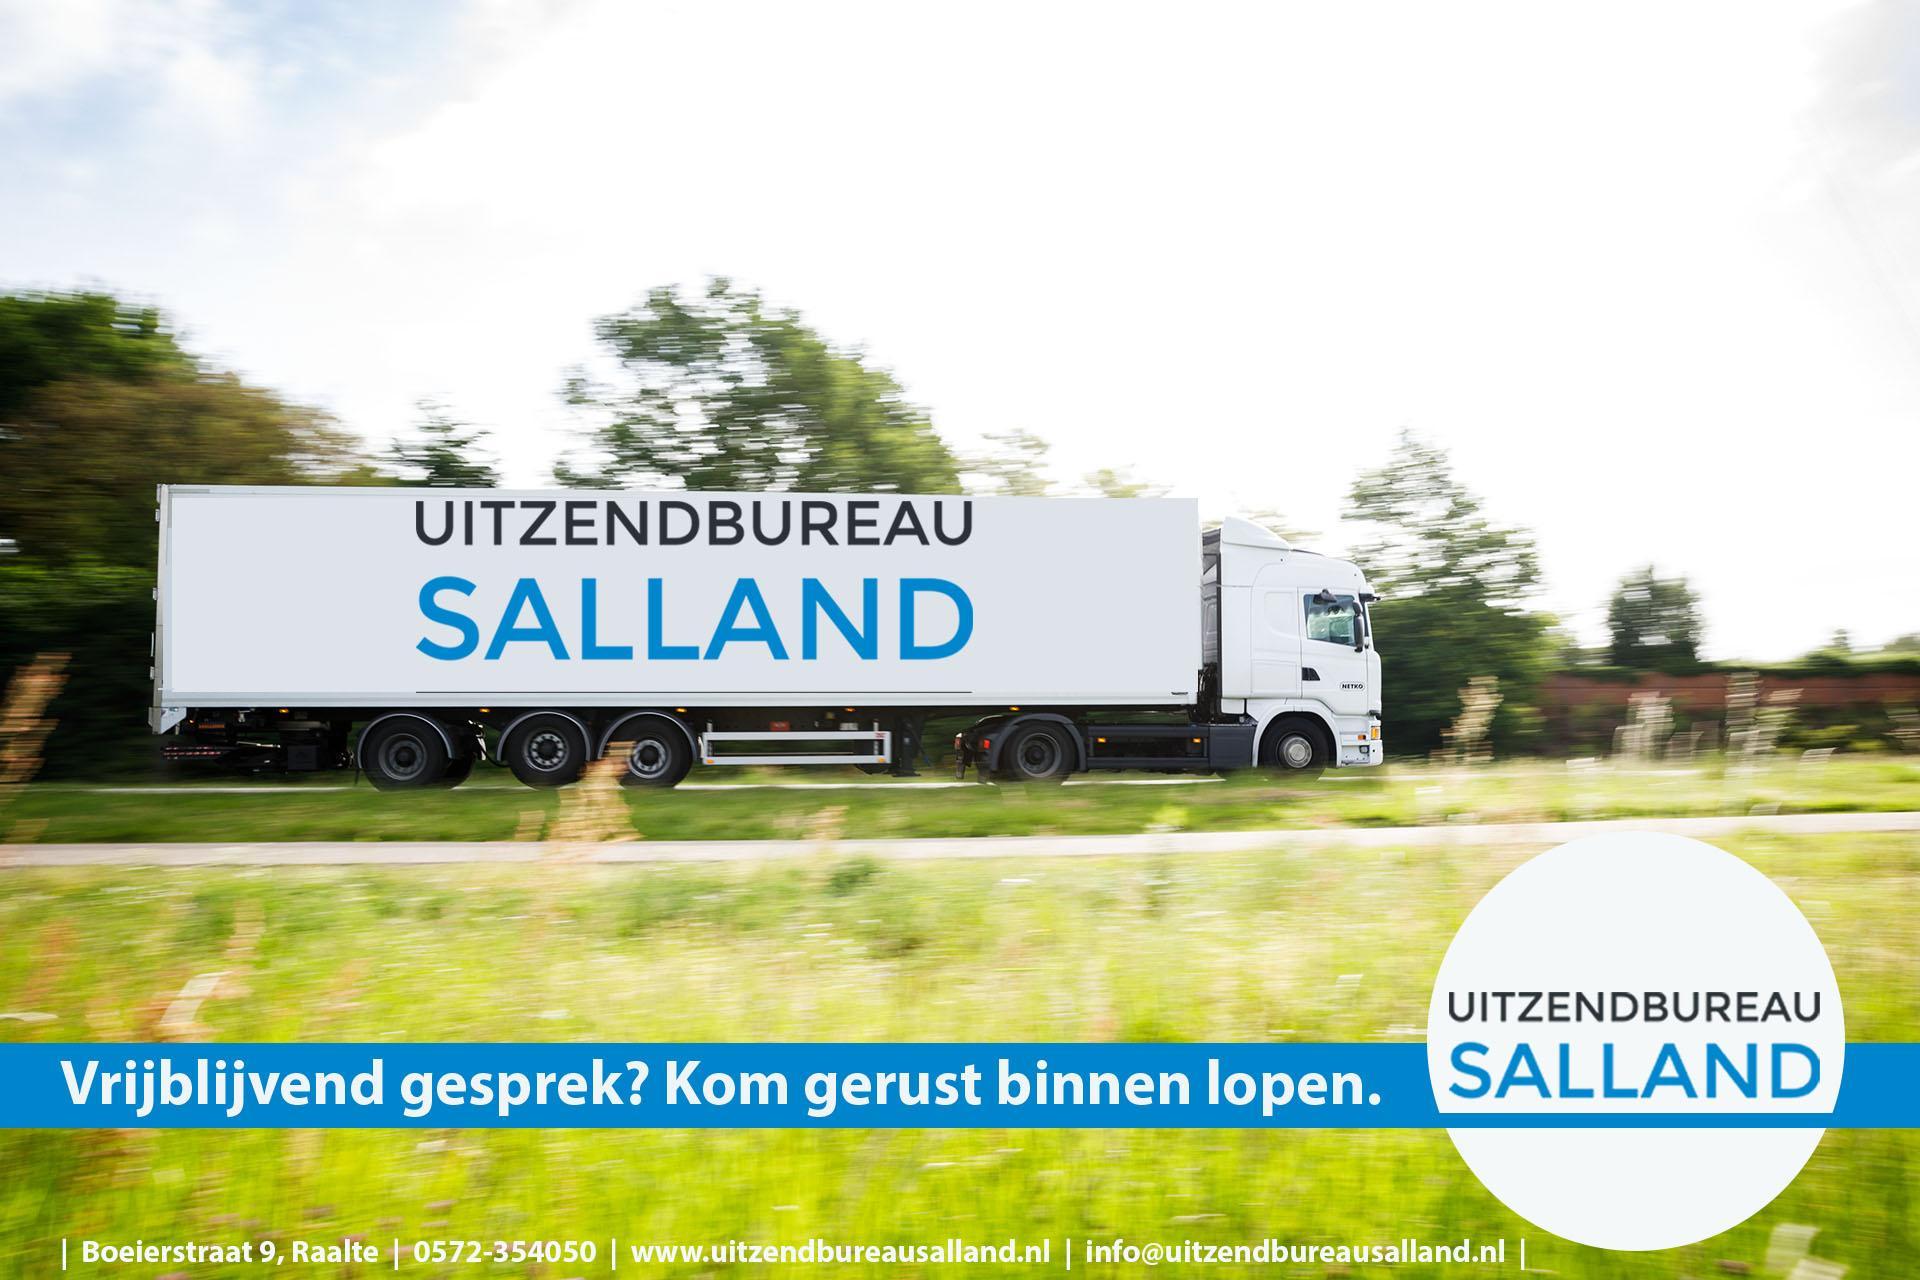 CE Chauffeur koel- en diepvriesproducten in Raalte